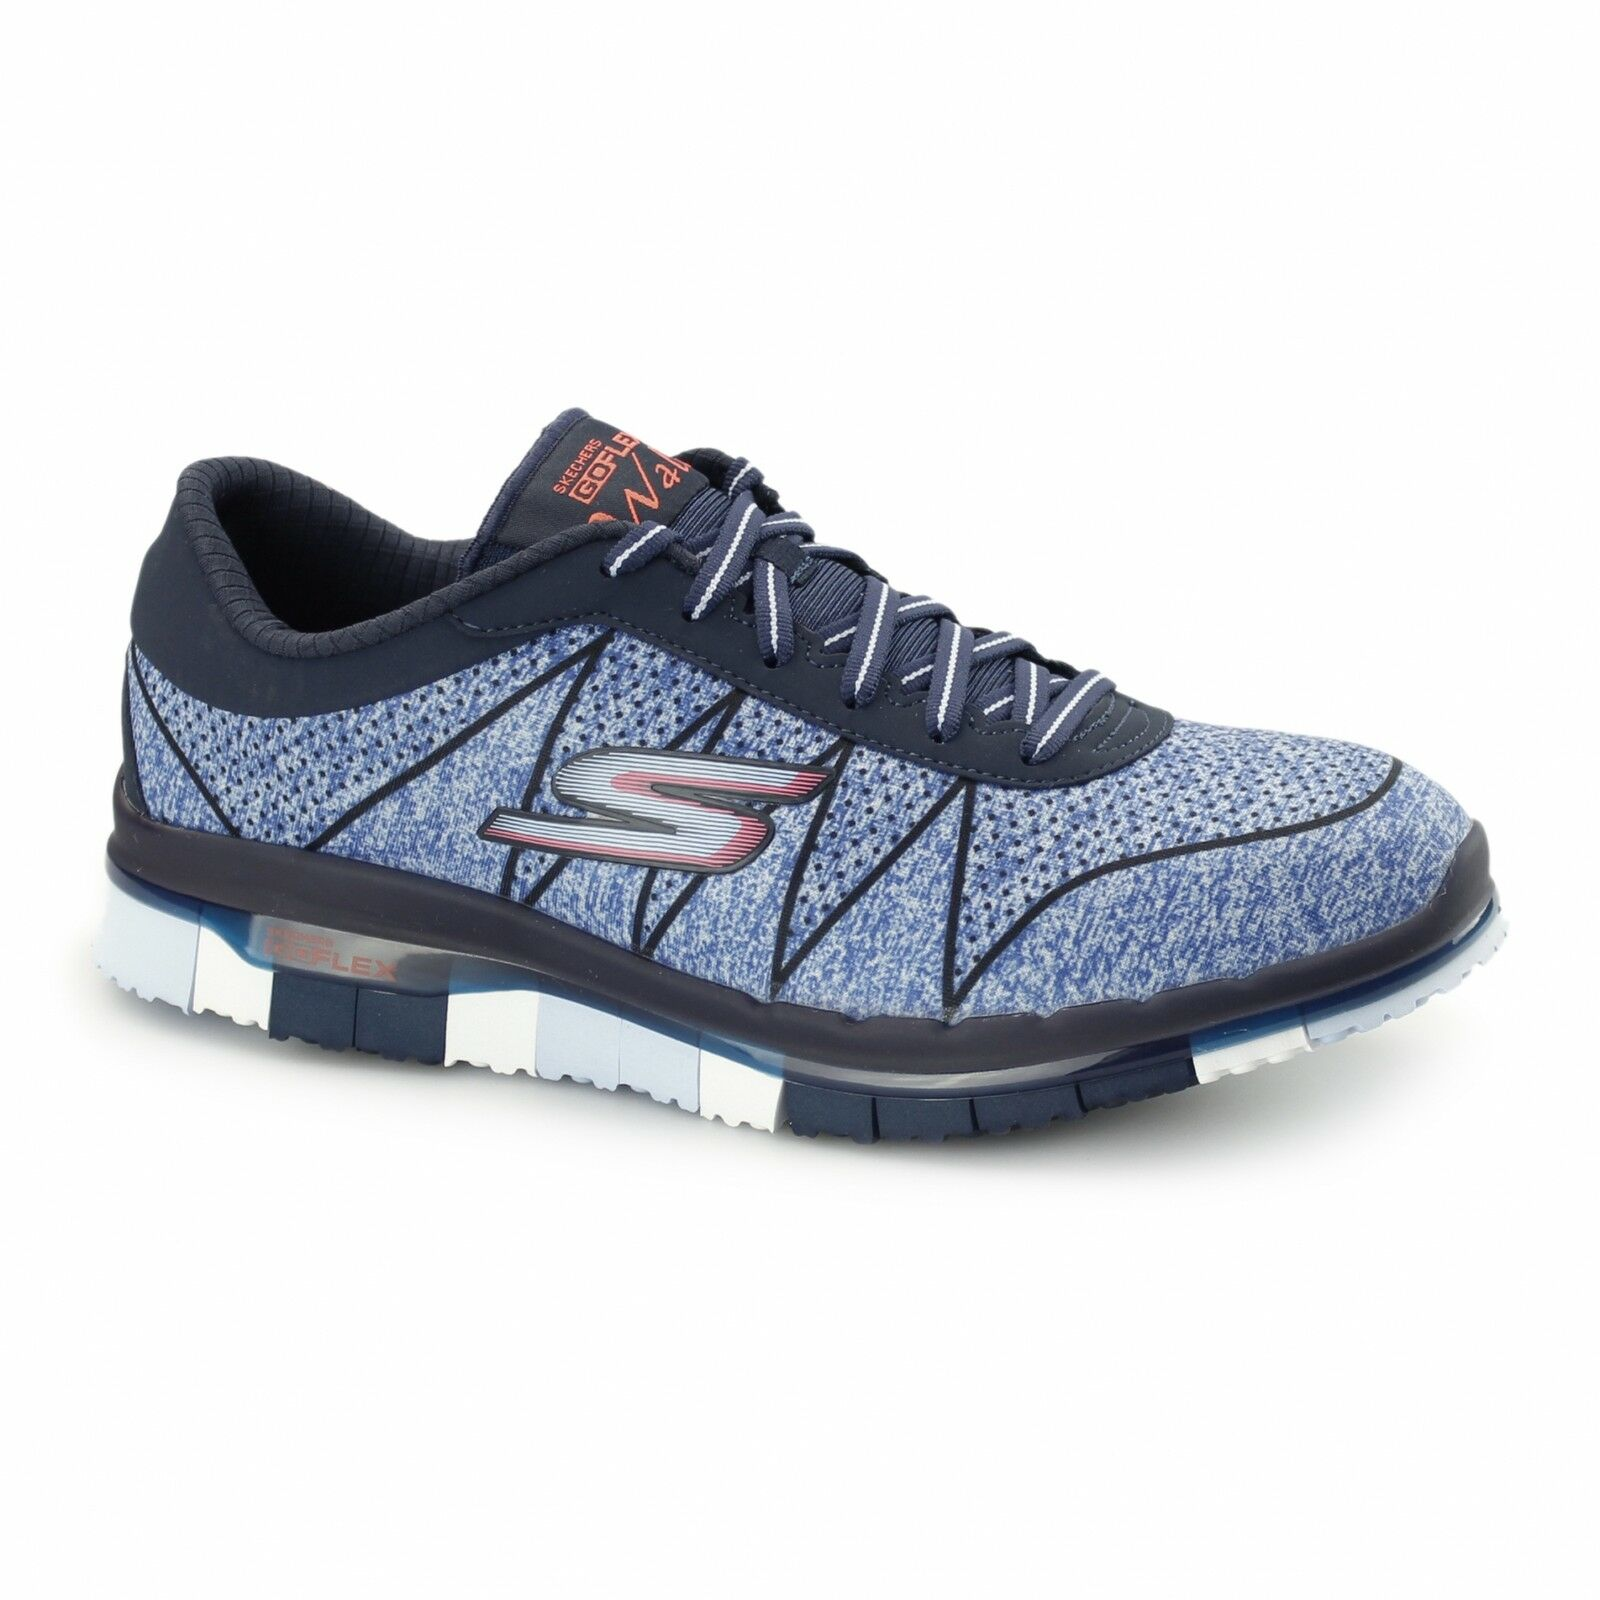 Skechers GO FLEX WALK - ABILITY Ladies Lace Up Sports Comfort Trainers Navy/Blue